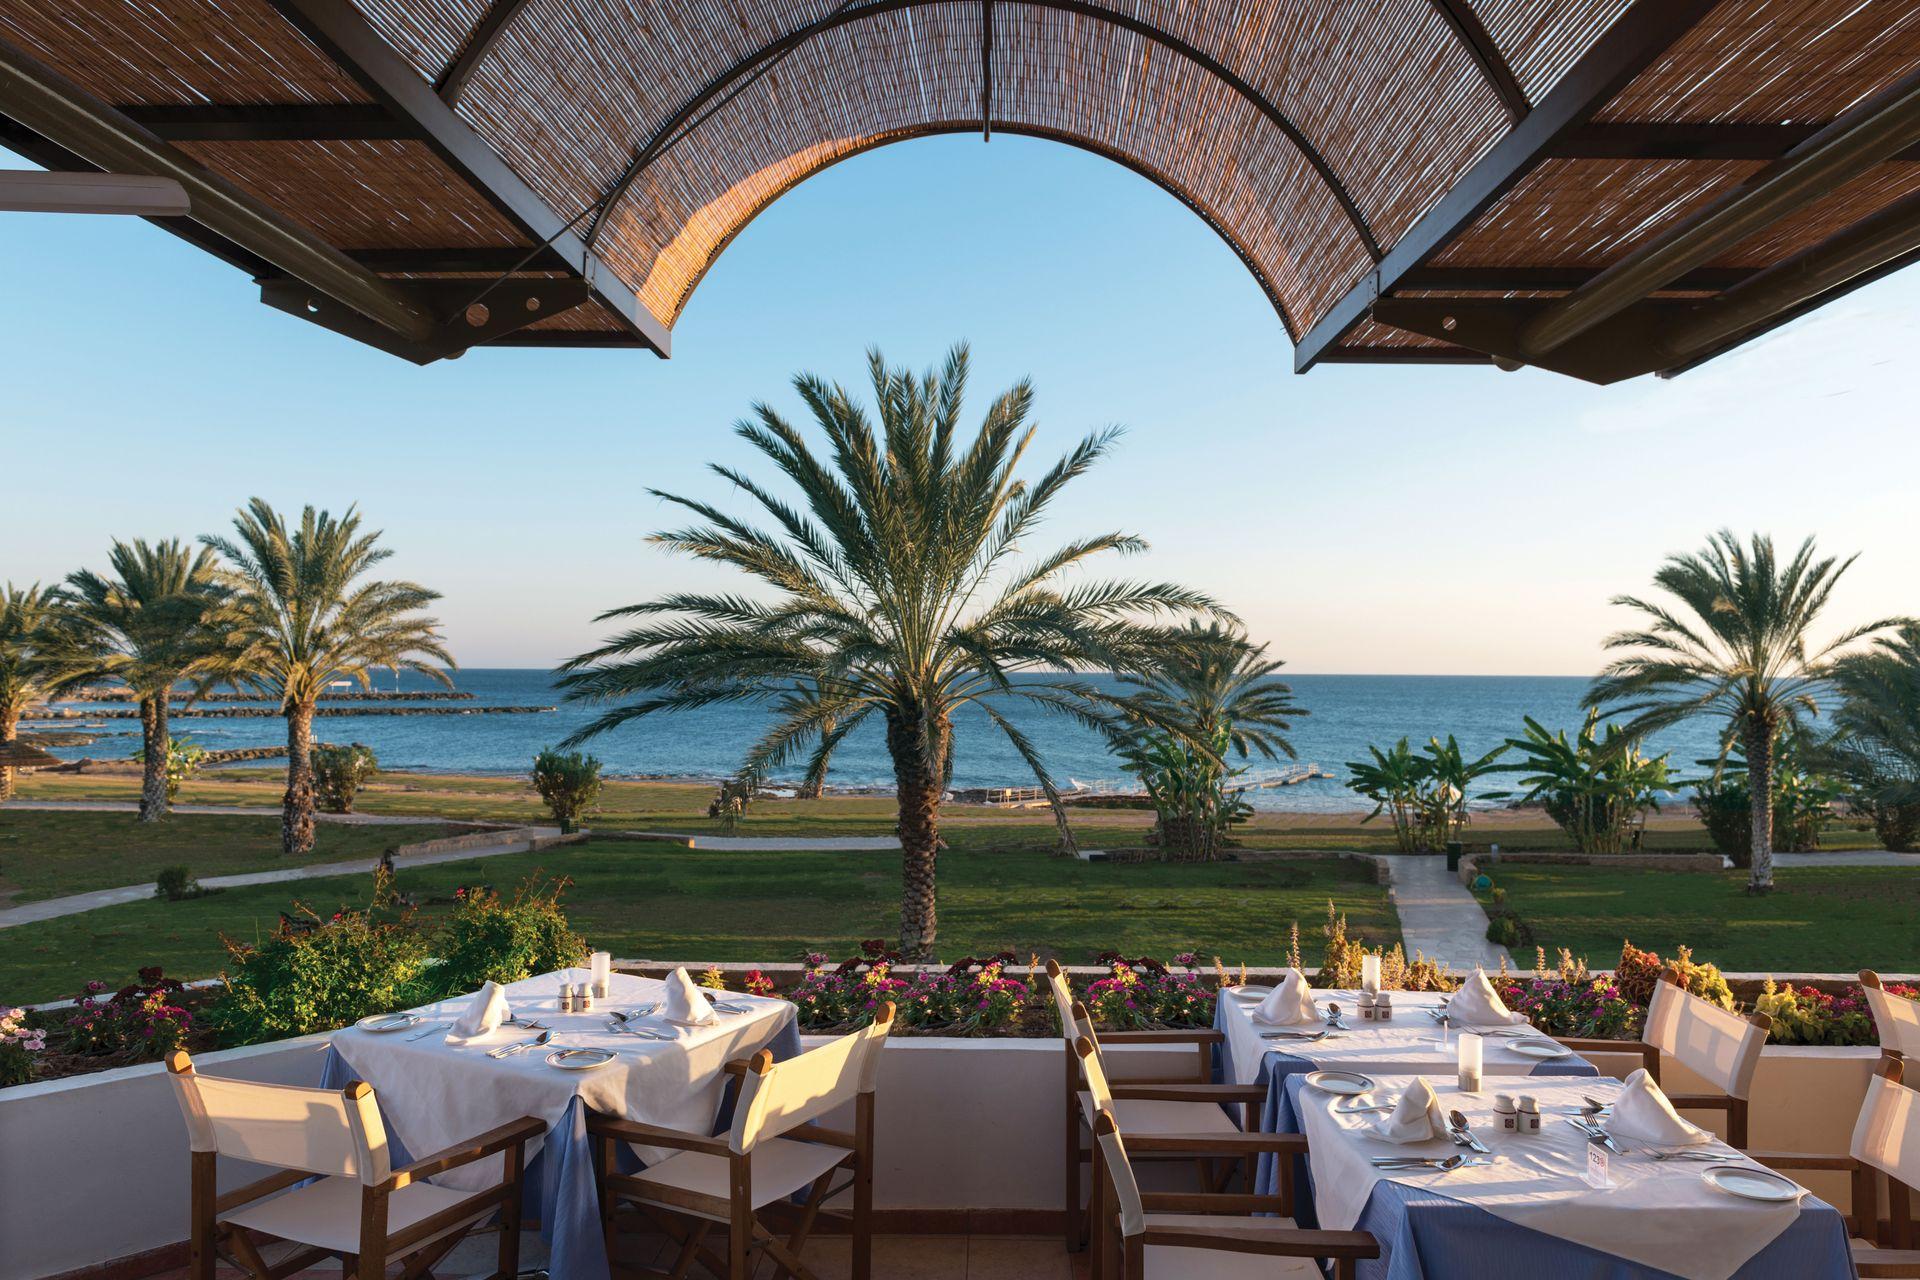 _15 athena royal beach hotel pygmalion restaurant_resized